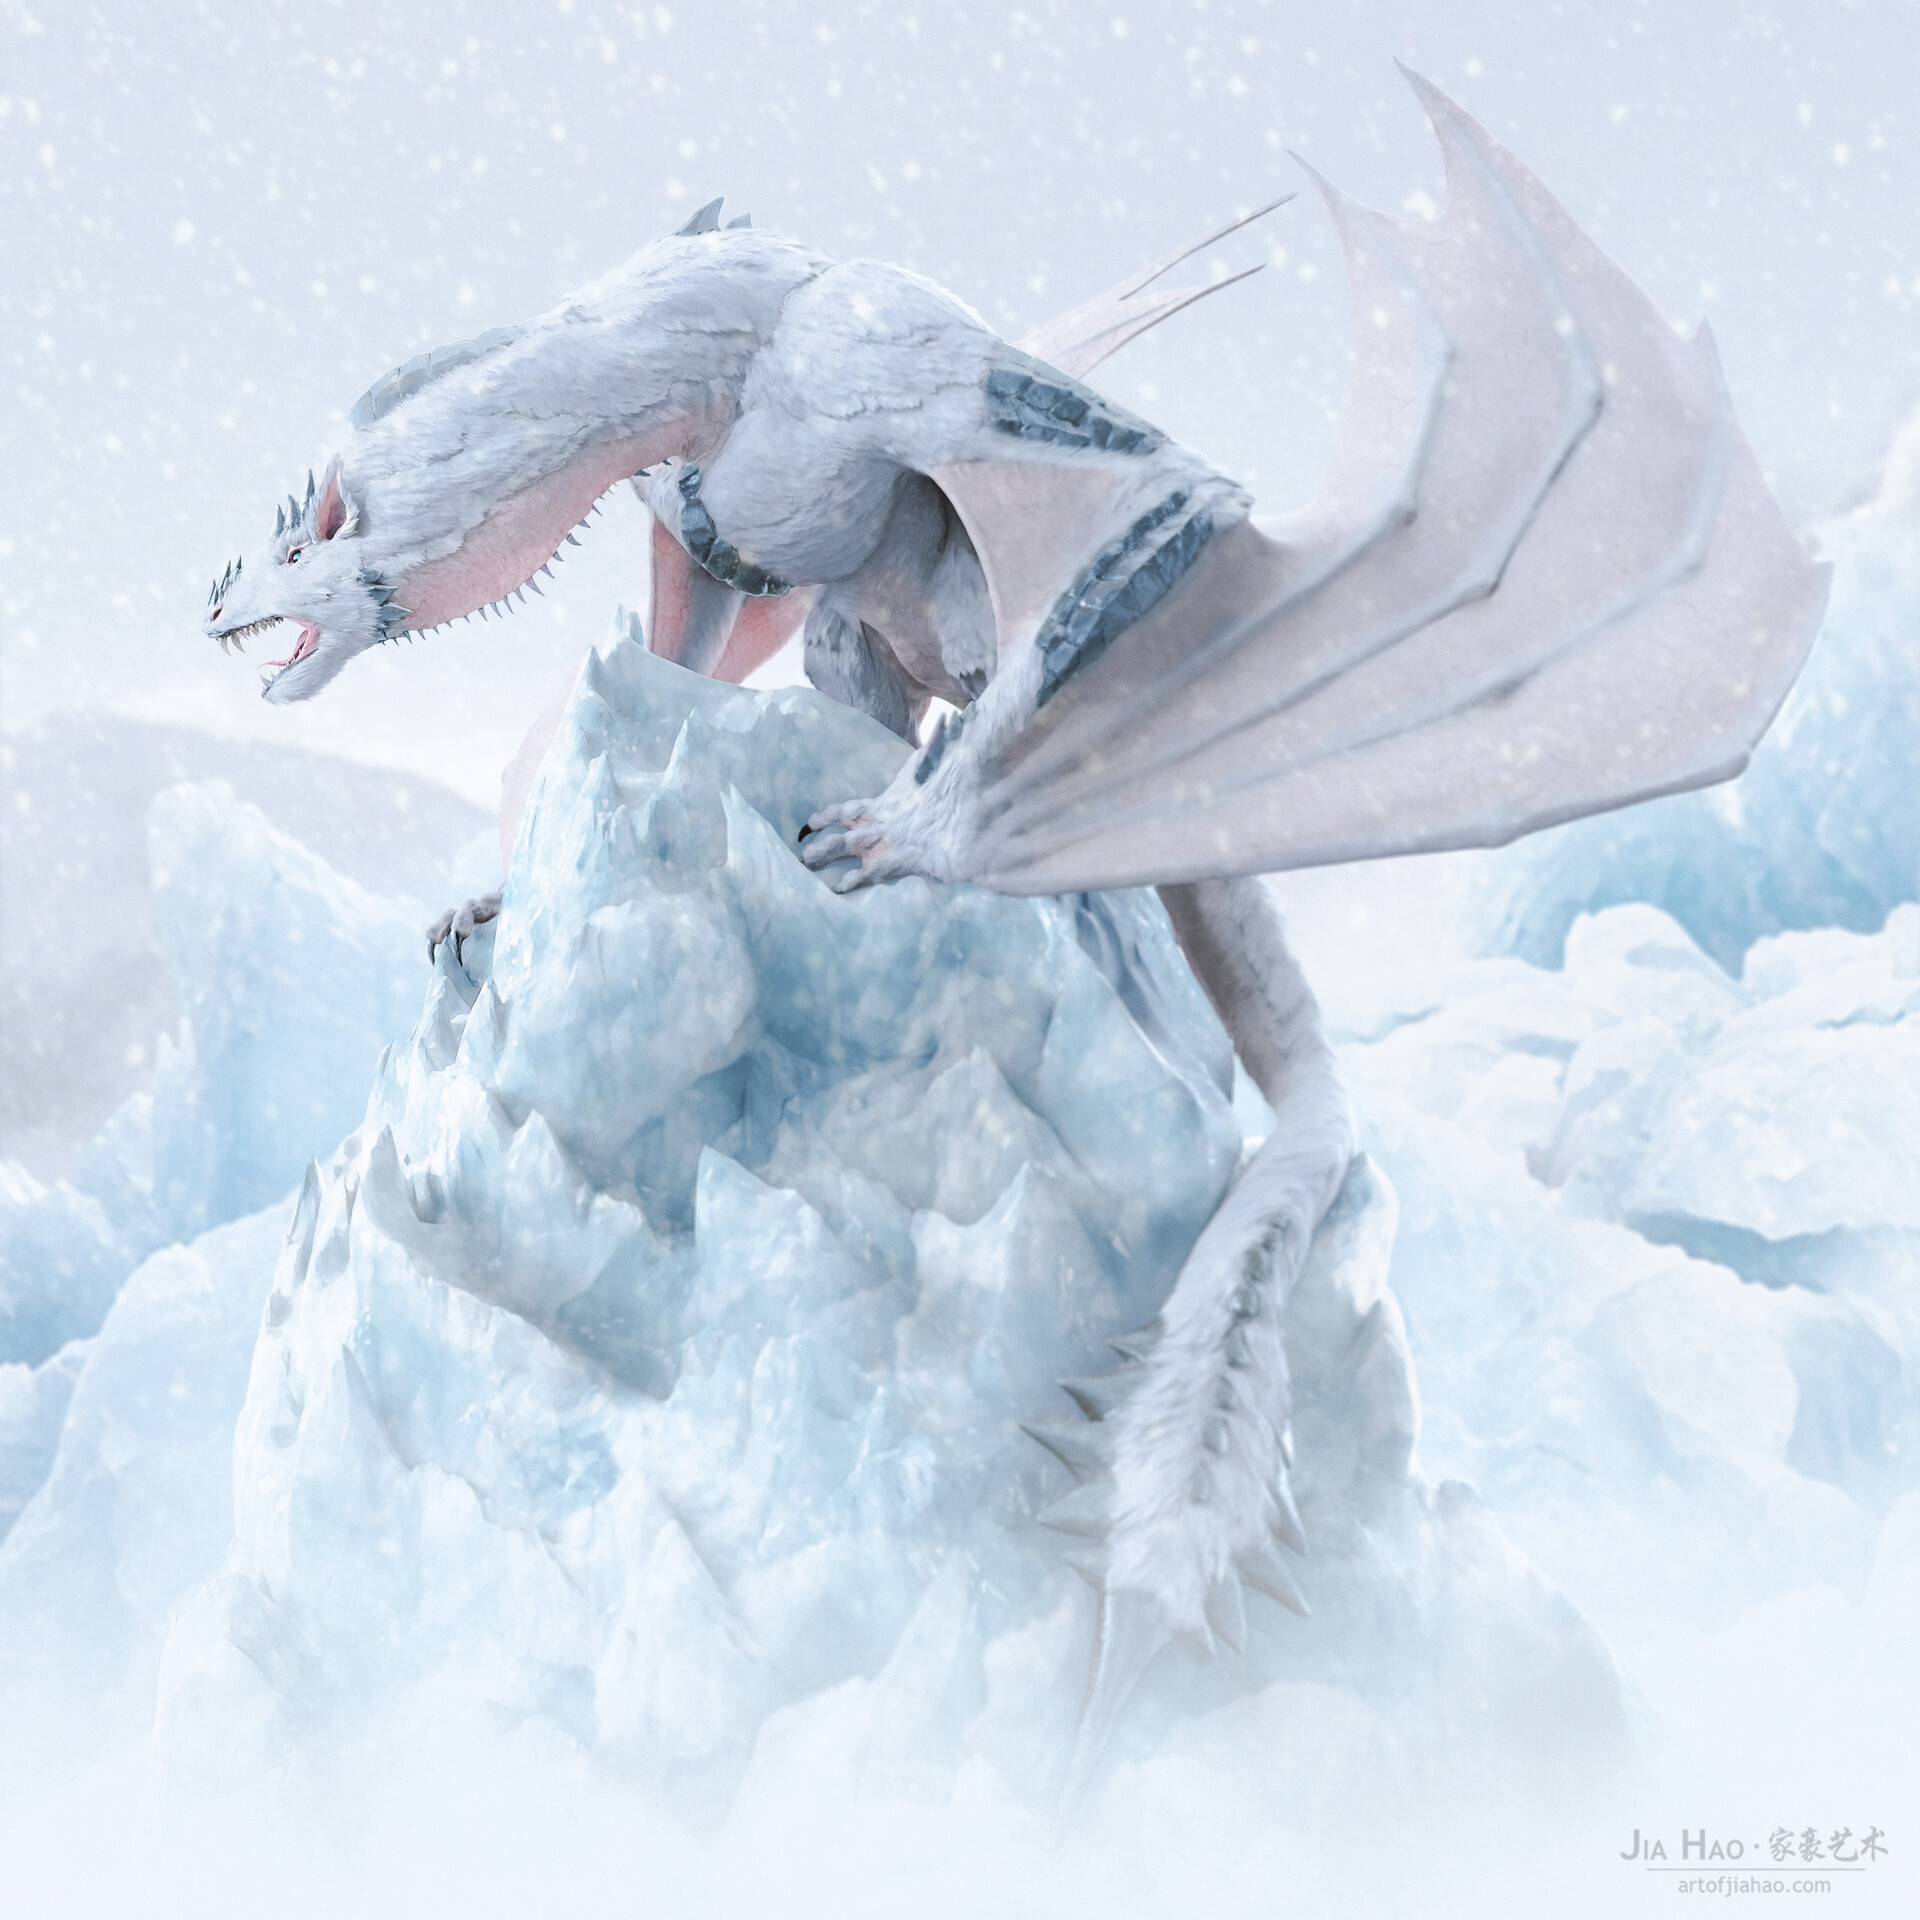 Jia hao 2018 snowdragon comp 01